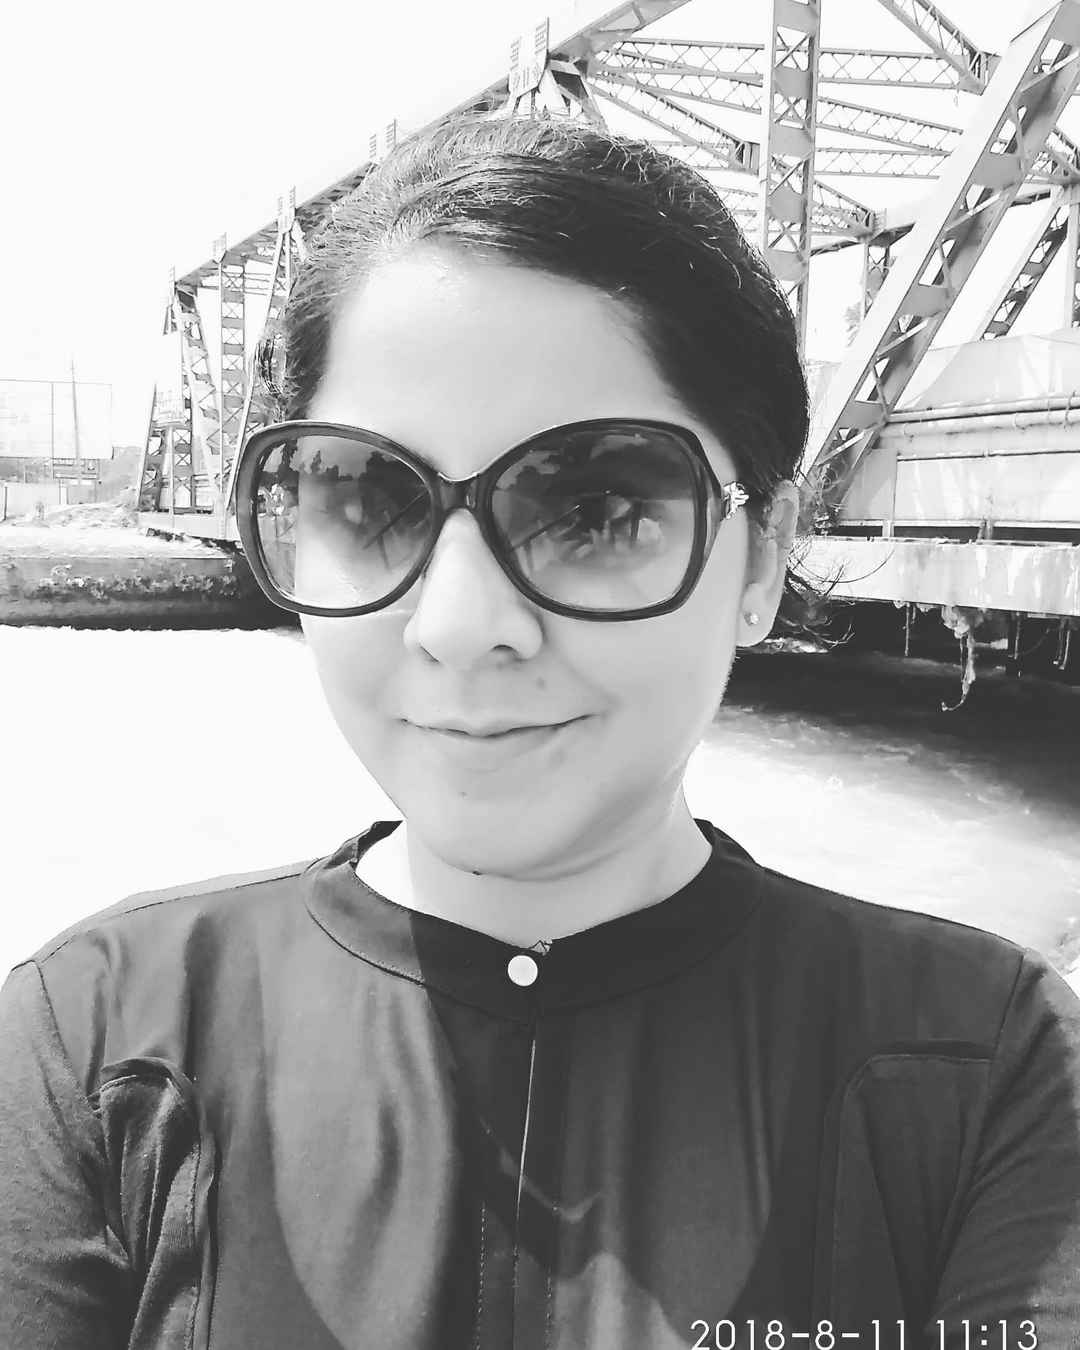 #SelfieWithAView#TripotoCommunity